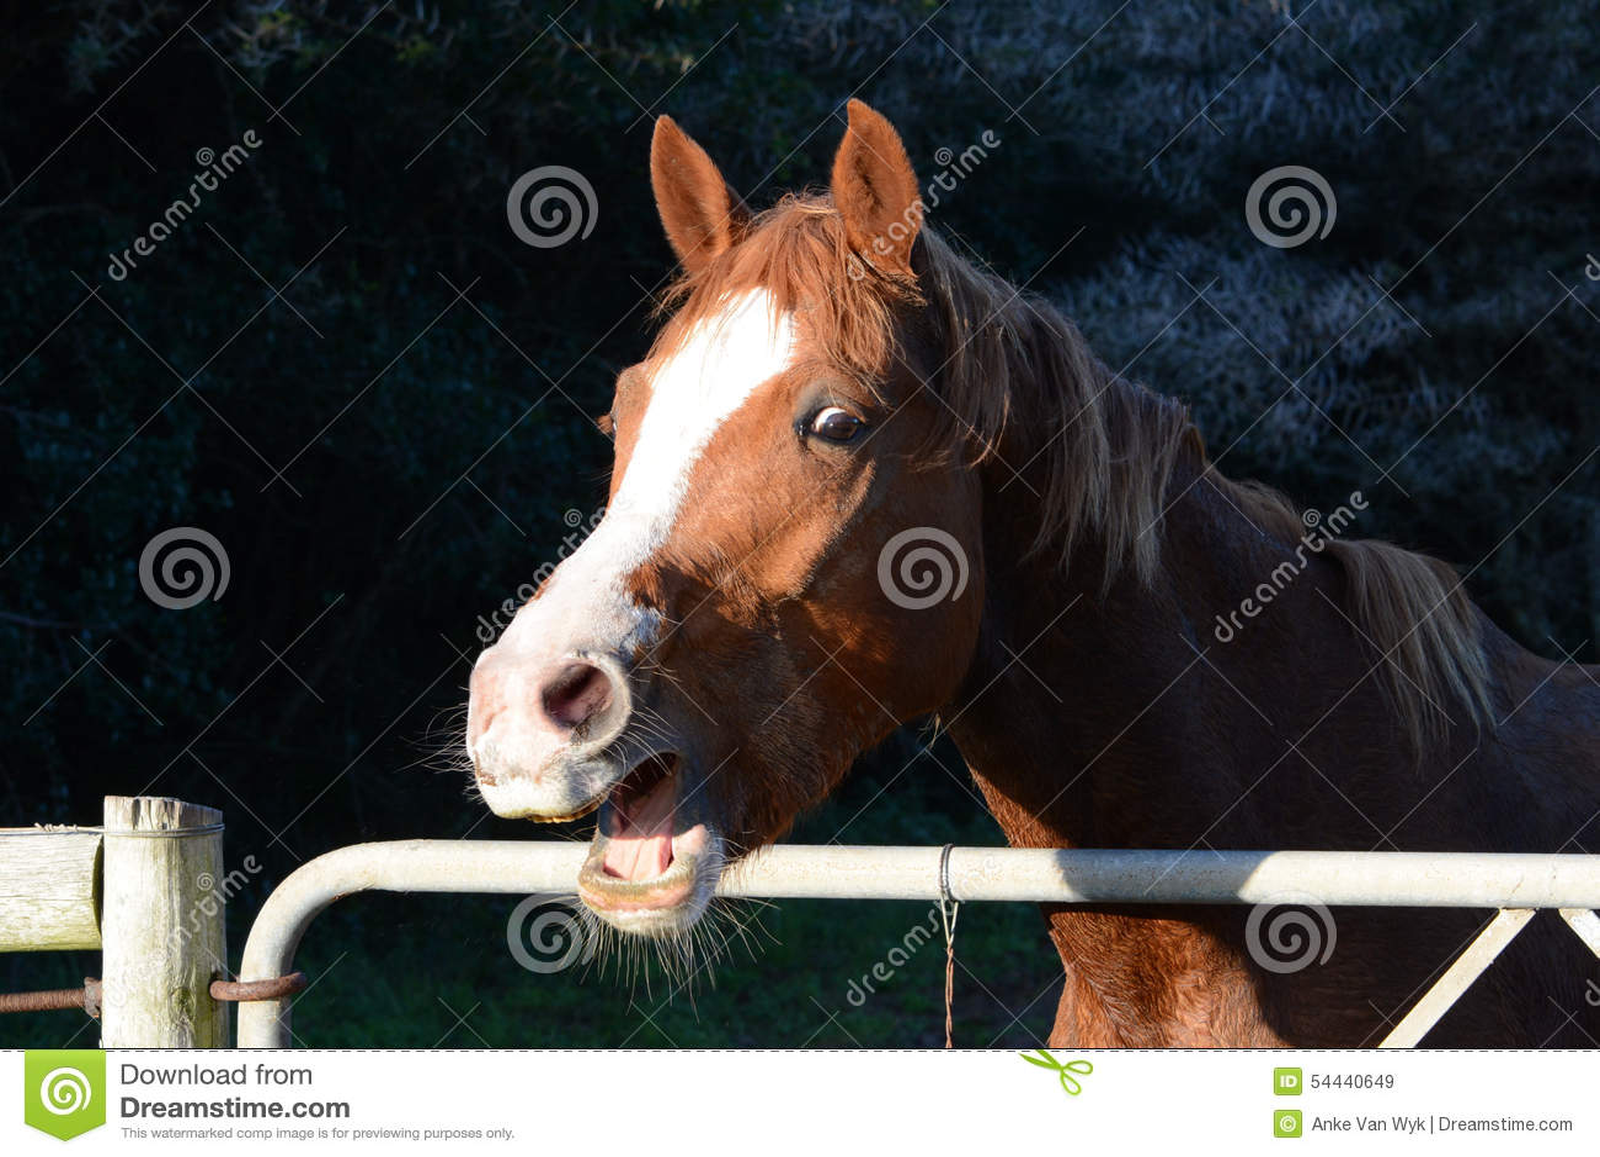 Talking farm horse